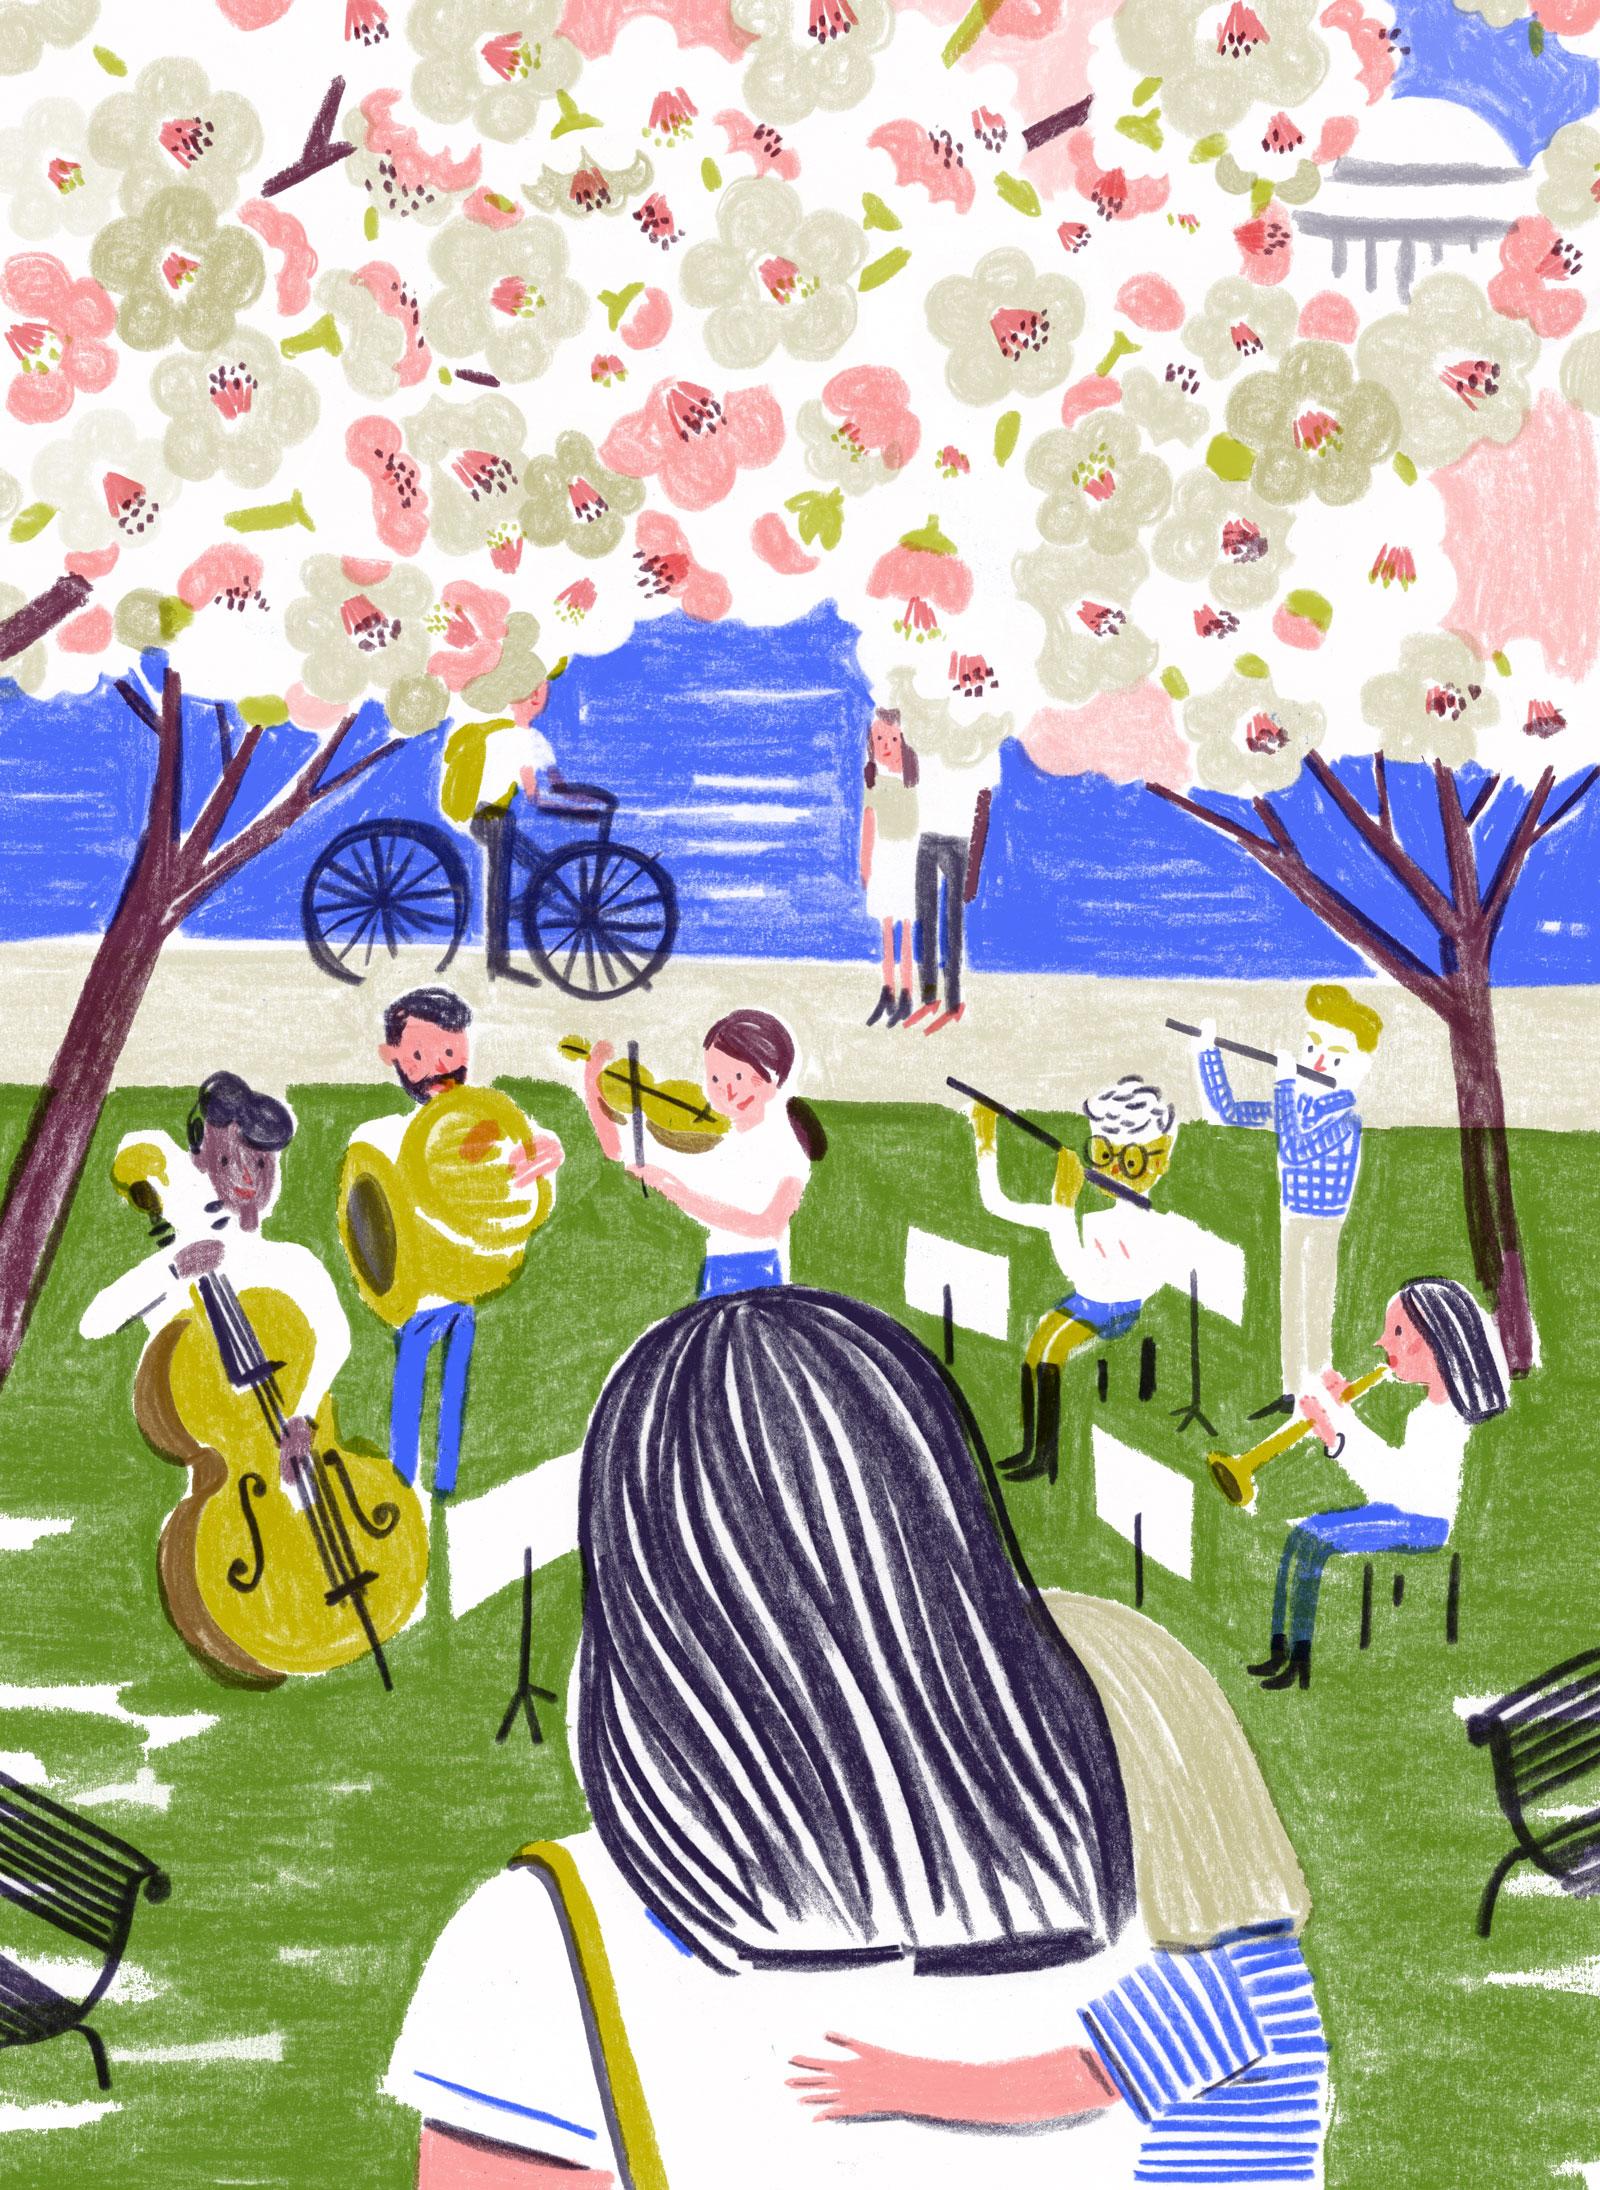 illustration_edithcarron_newyorker_april2017_festival_24_doctravail_25_3_1600web_2.jpg